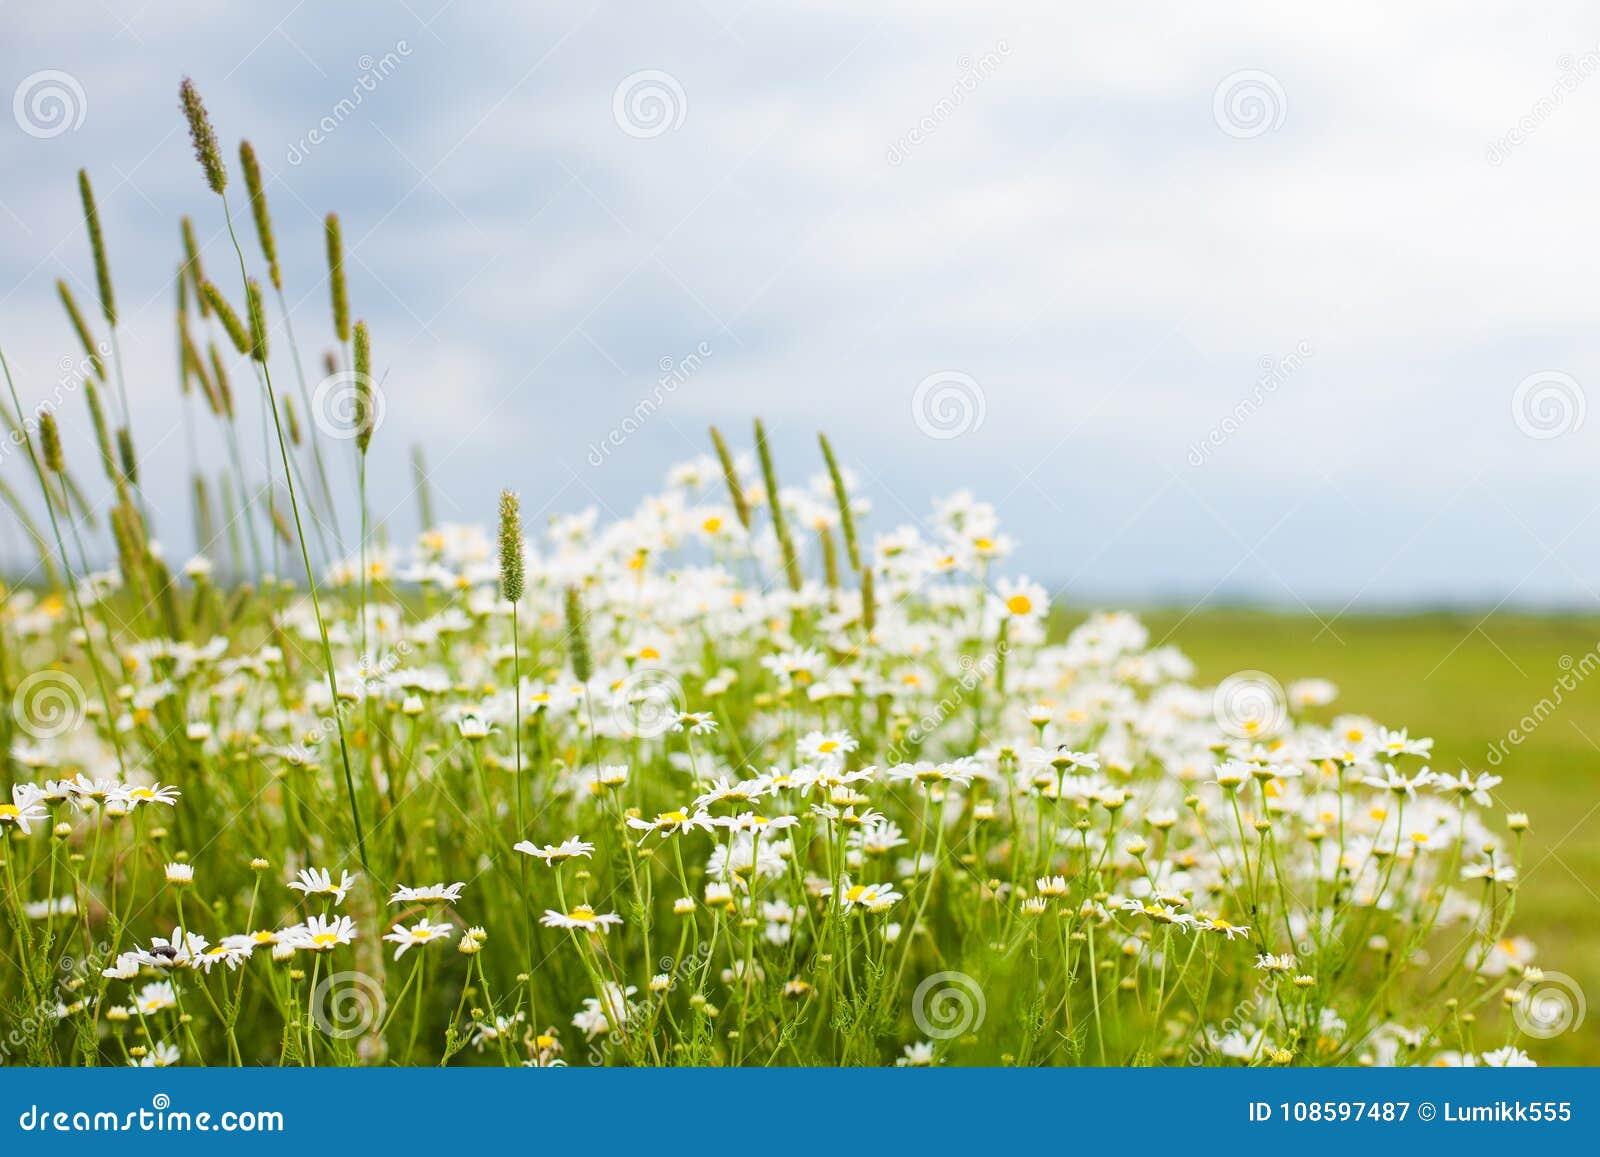 Rustic Nature Summer Flower Background